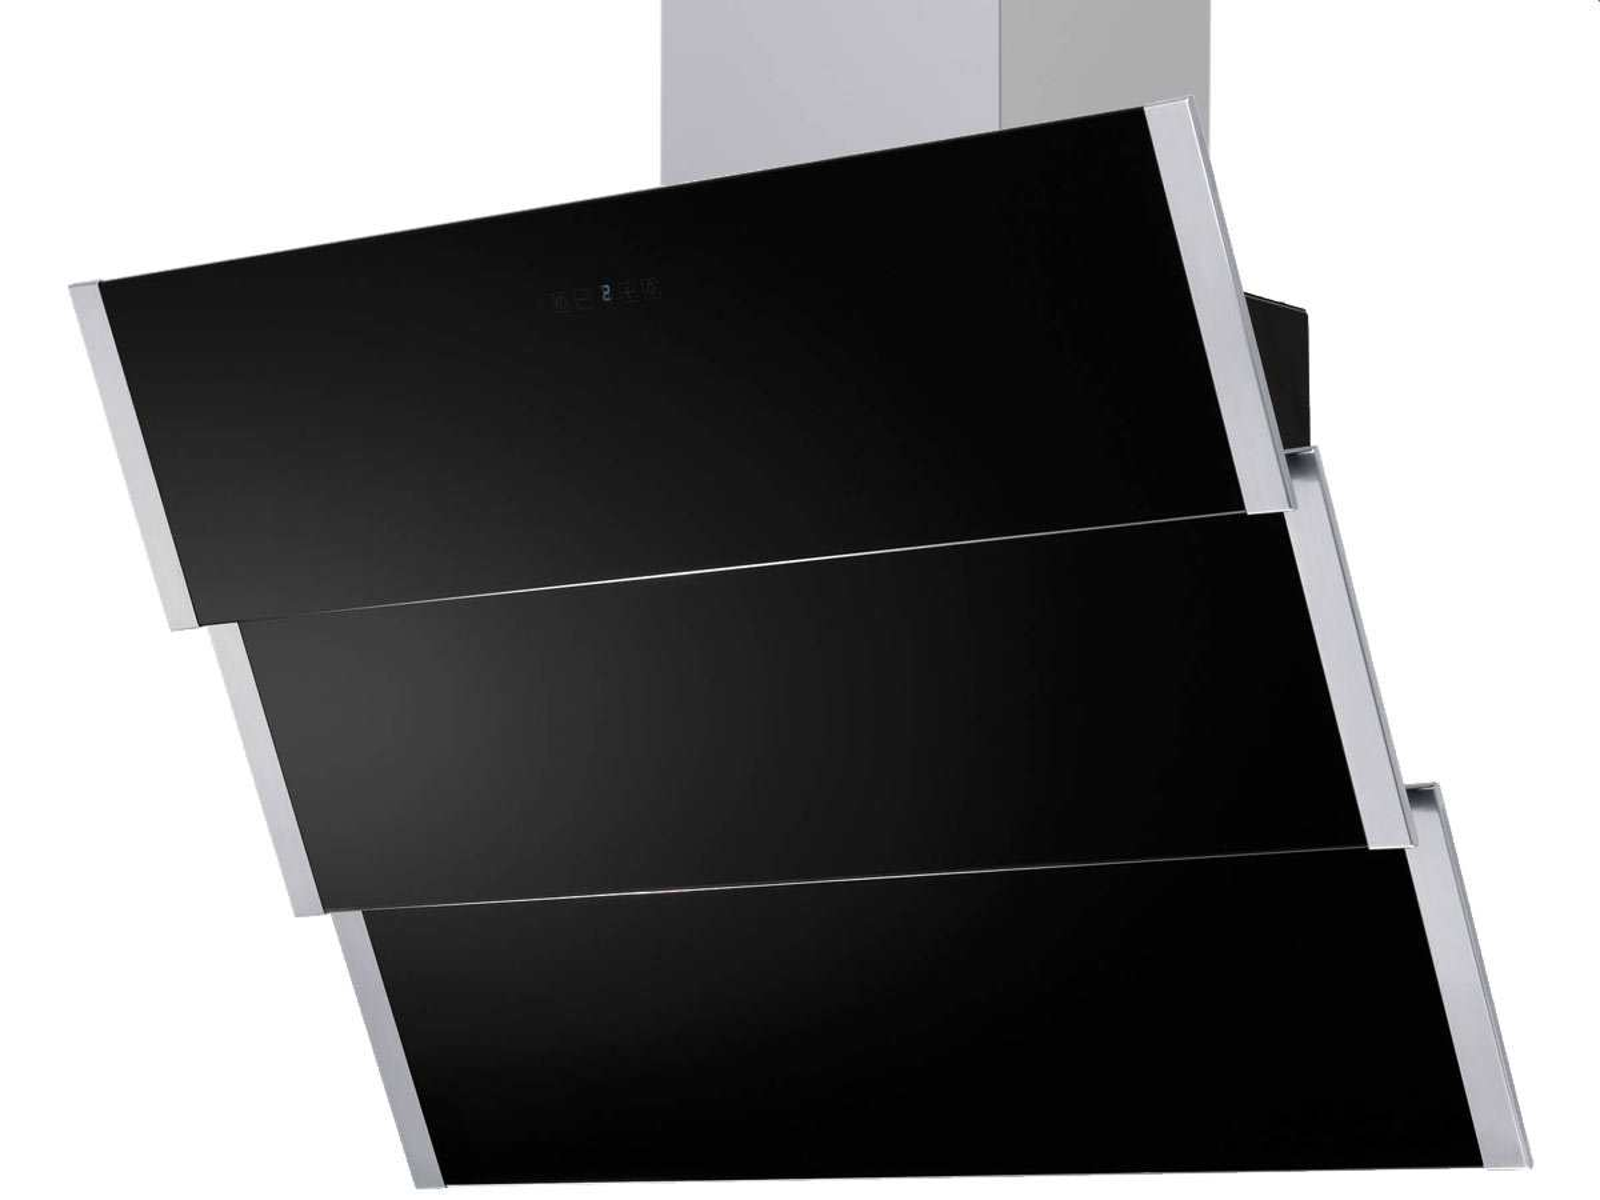 Dunstesse schwarz wandhaube kopffrei 75cm haube esse ebay for Dunstesse